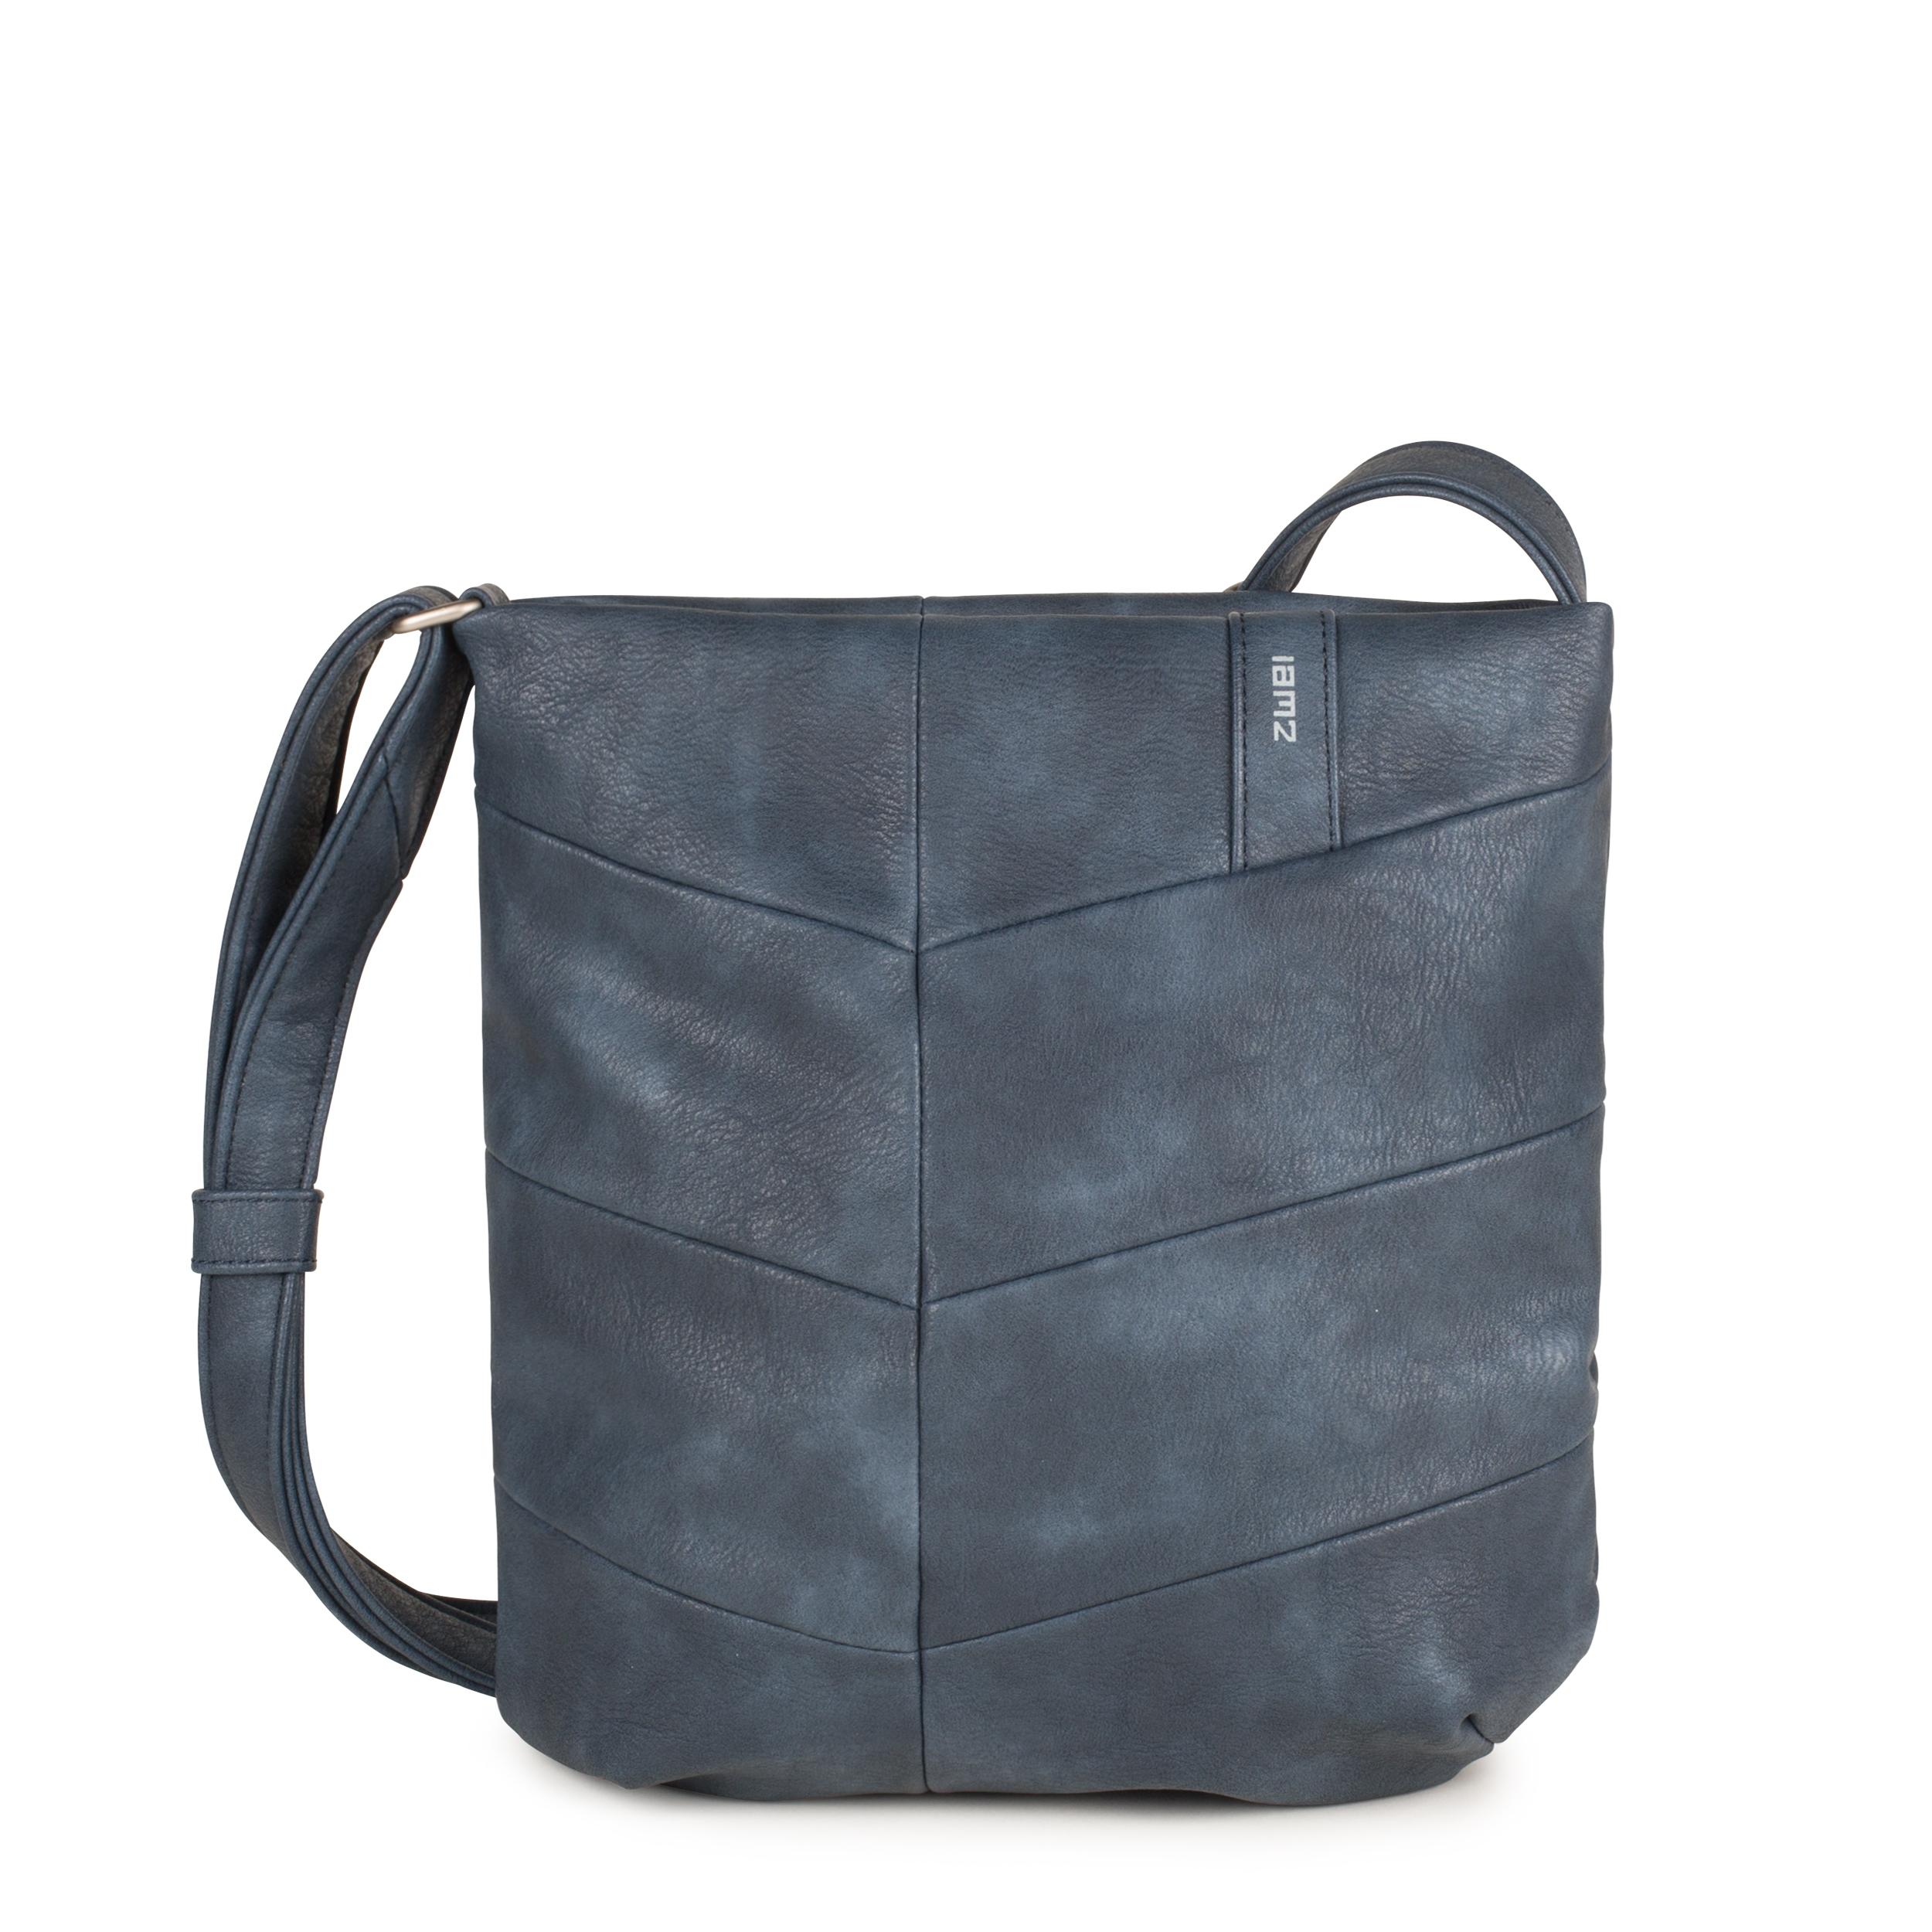 0feb134a265b8 ZWEI Handtasche Umhängetasche Damen LISSY LY10-z Kunstleder – Bild 7